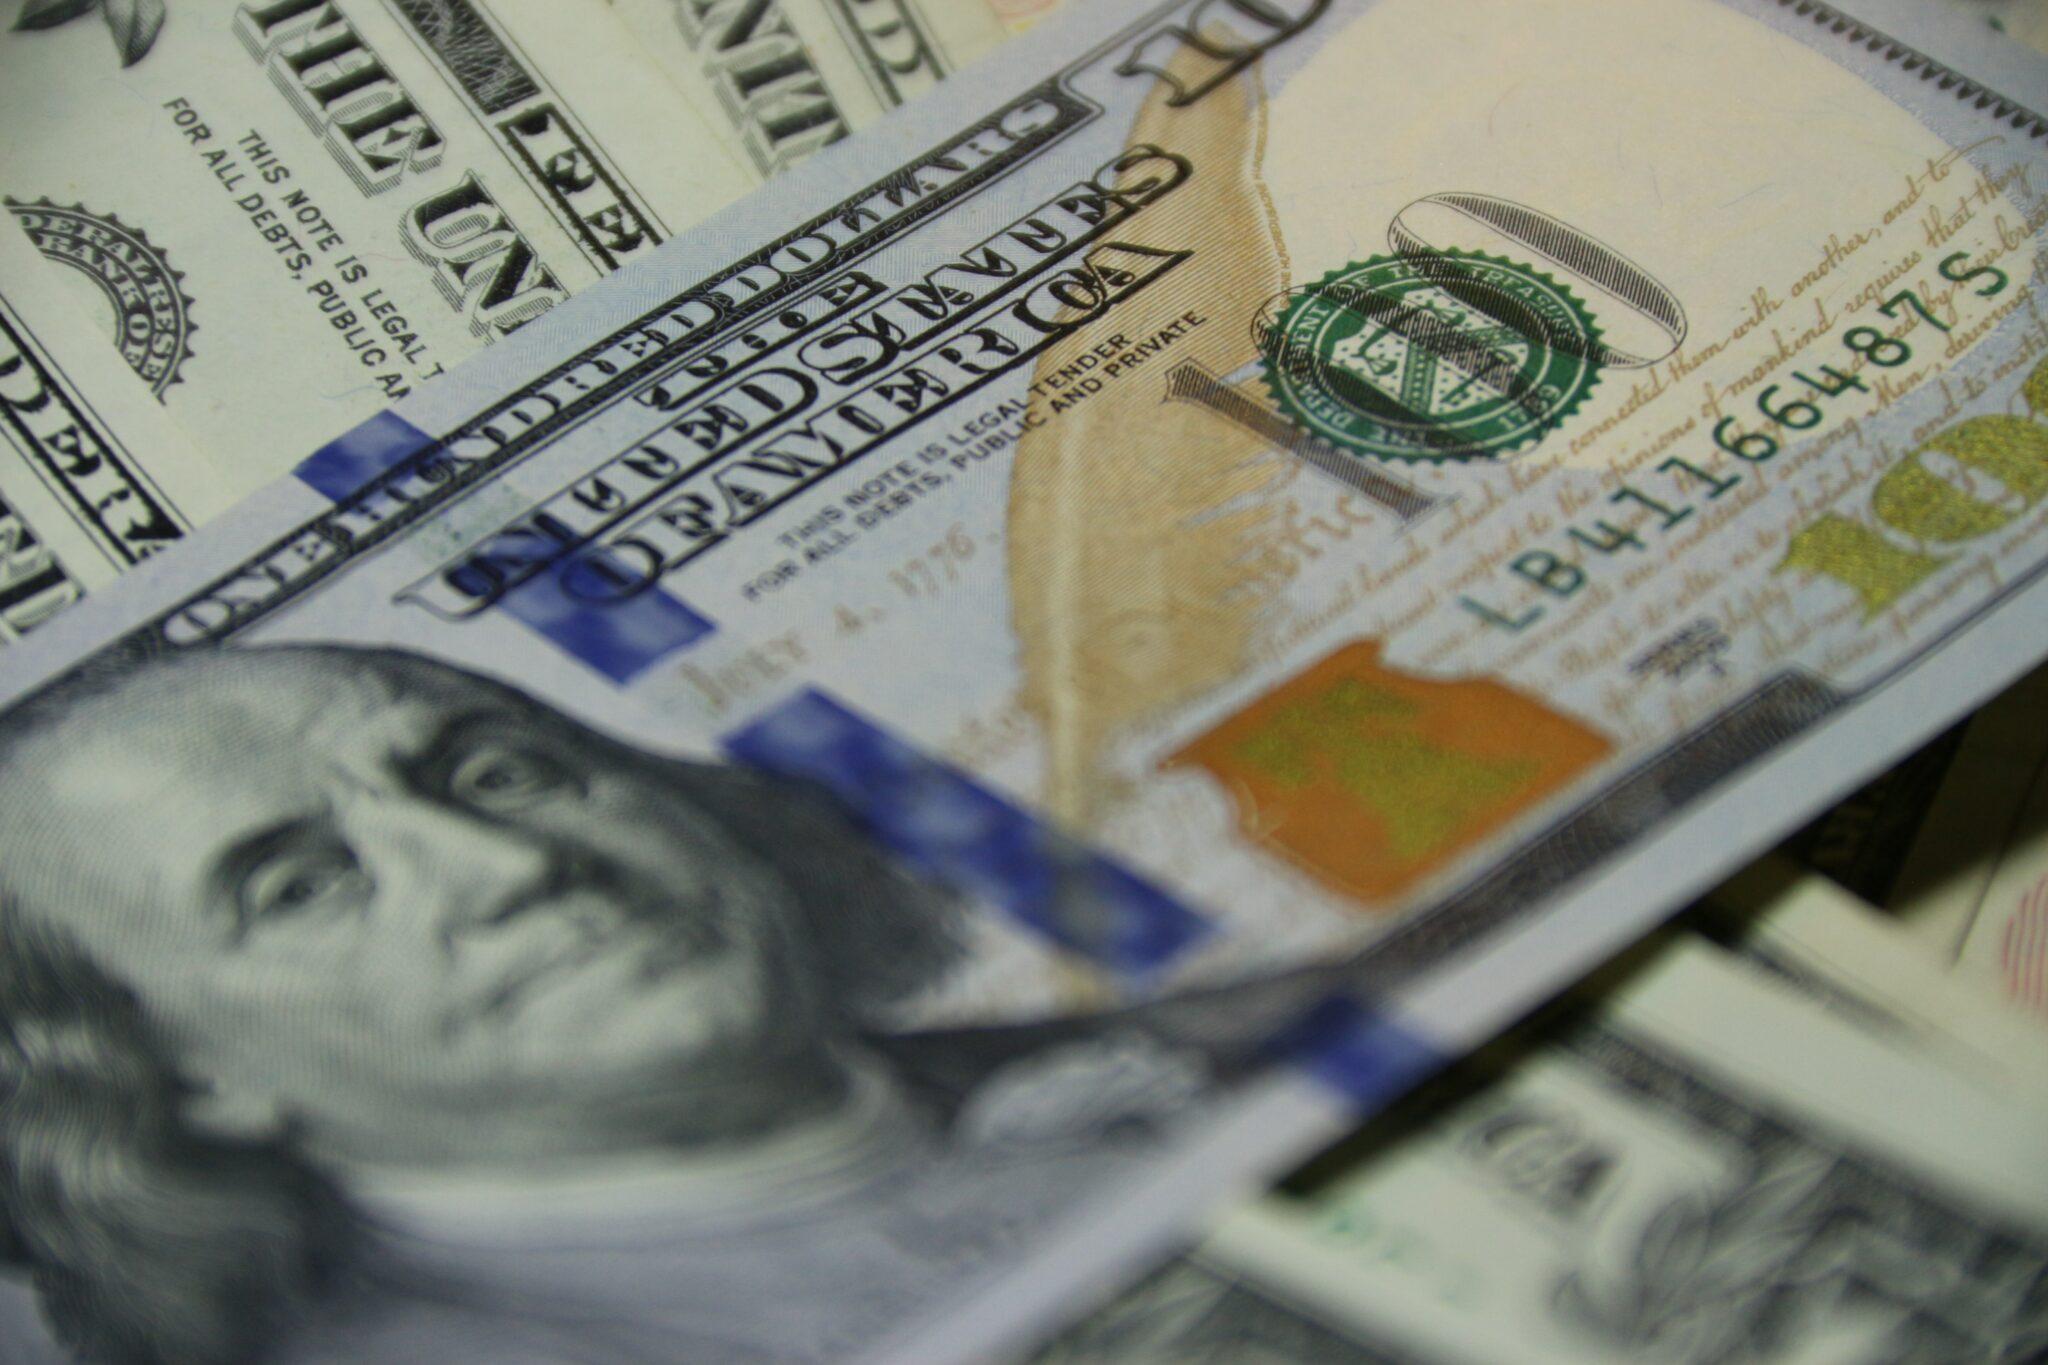 fraud money laundering